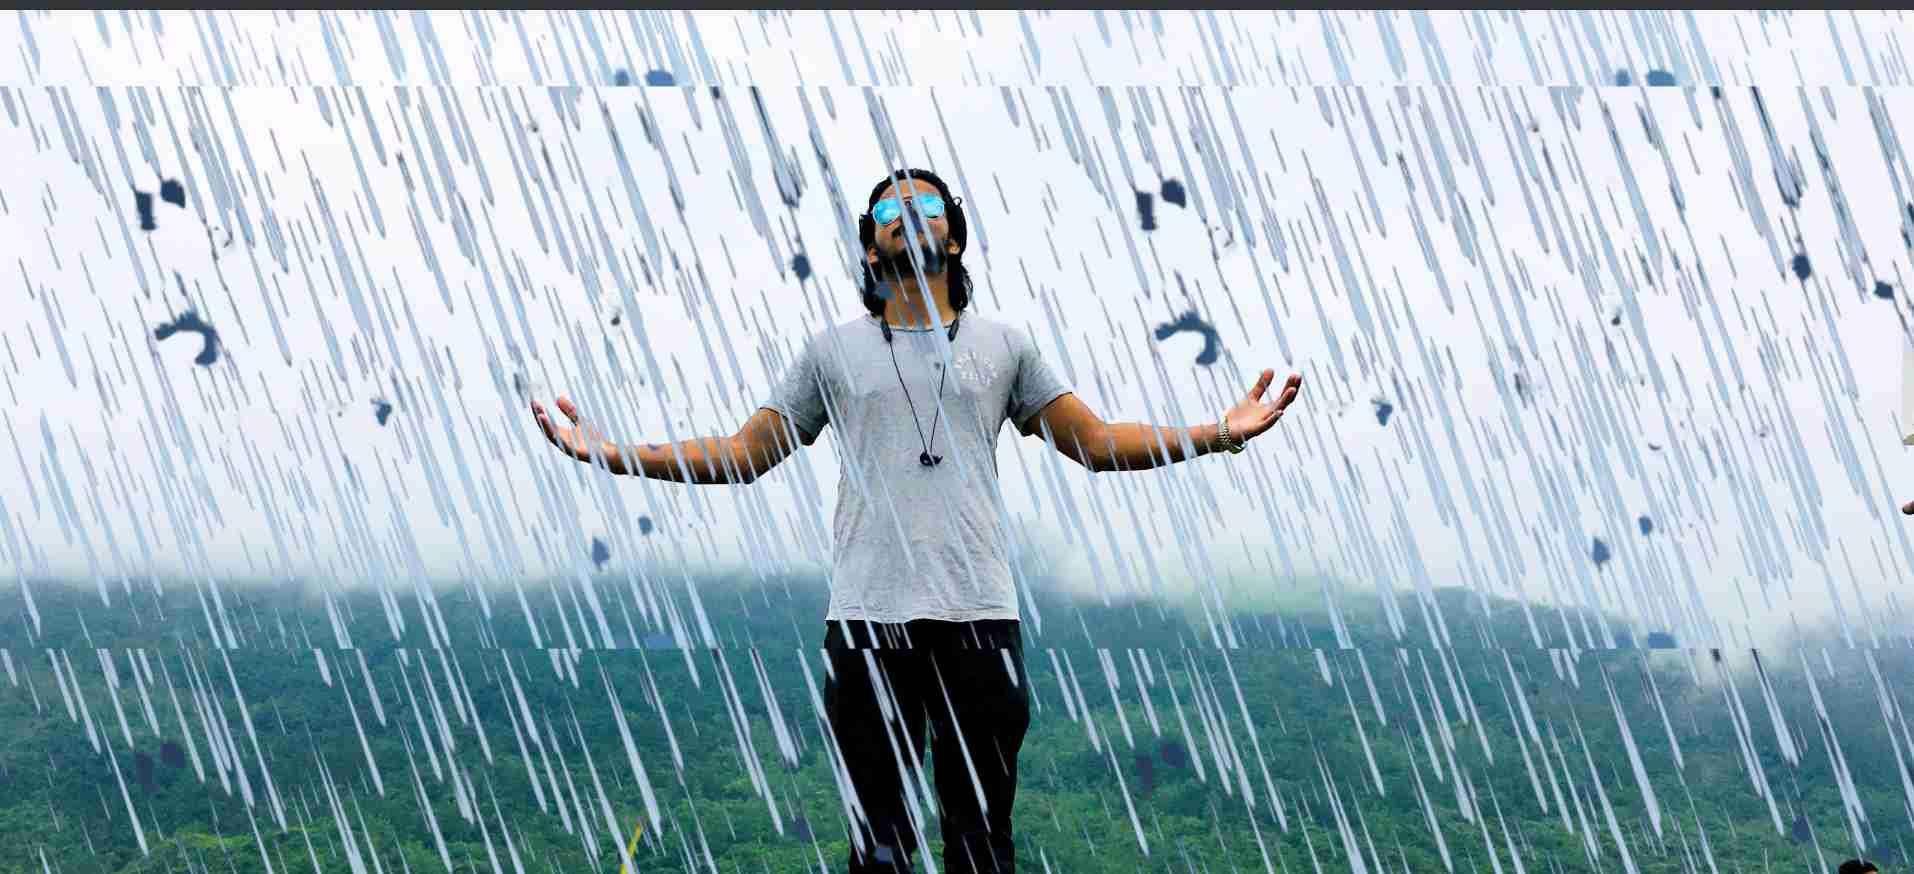 Rain effects Animation